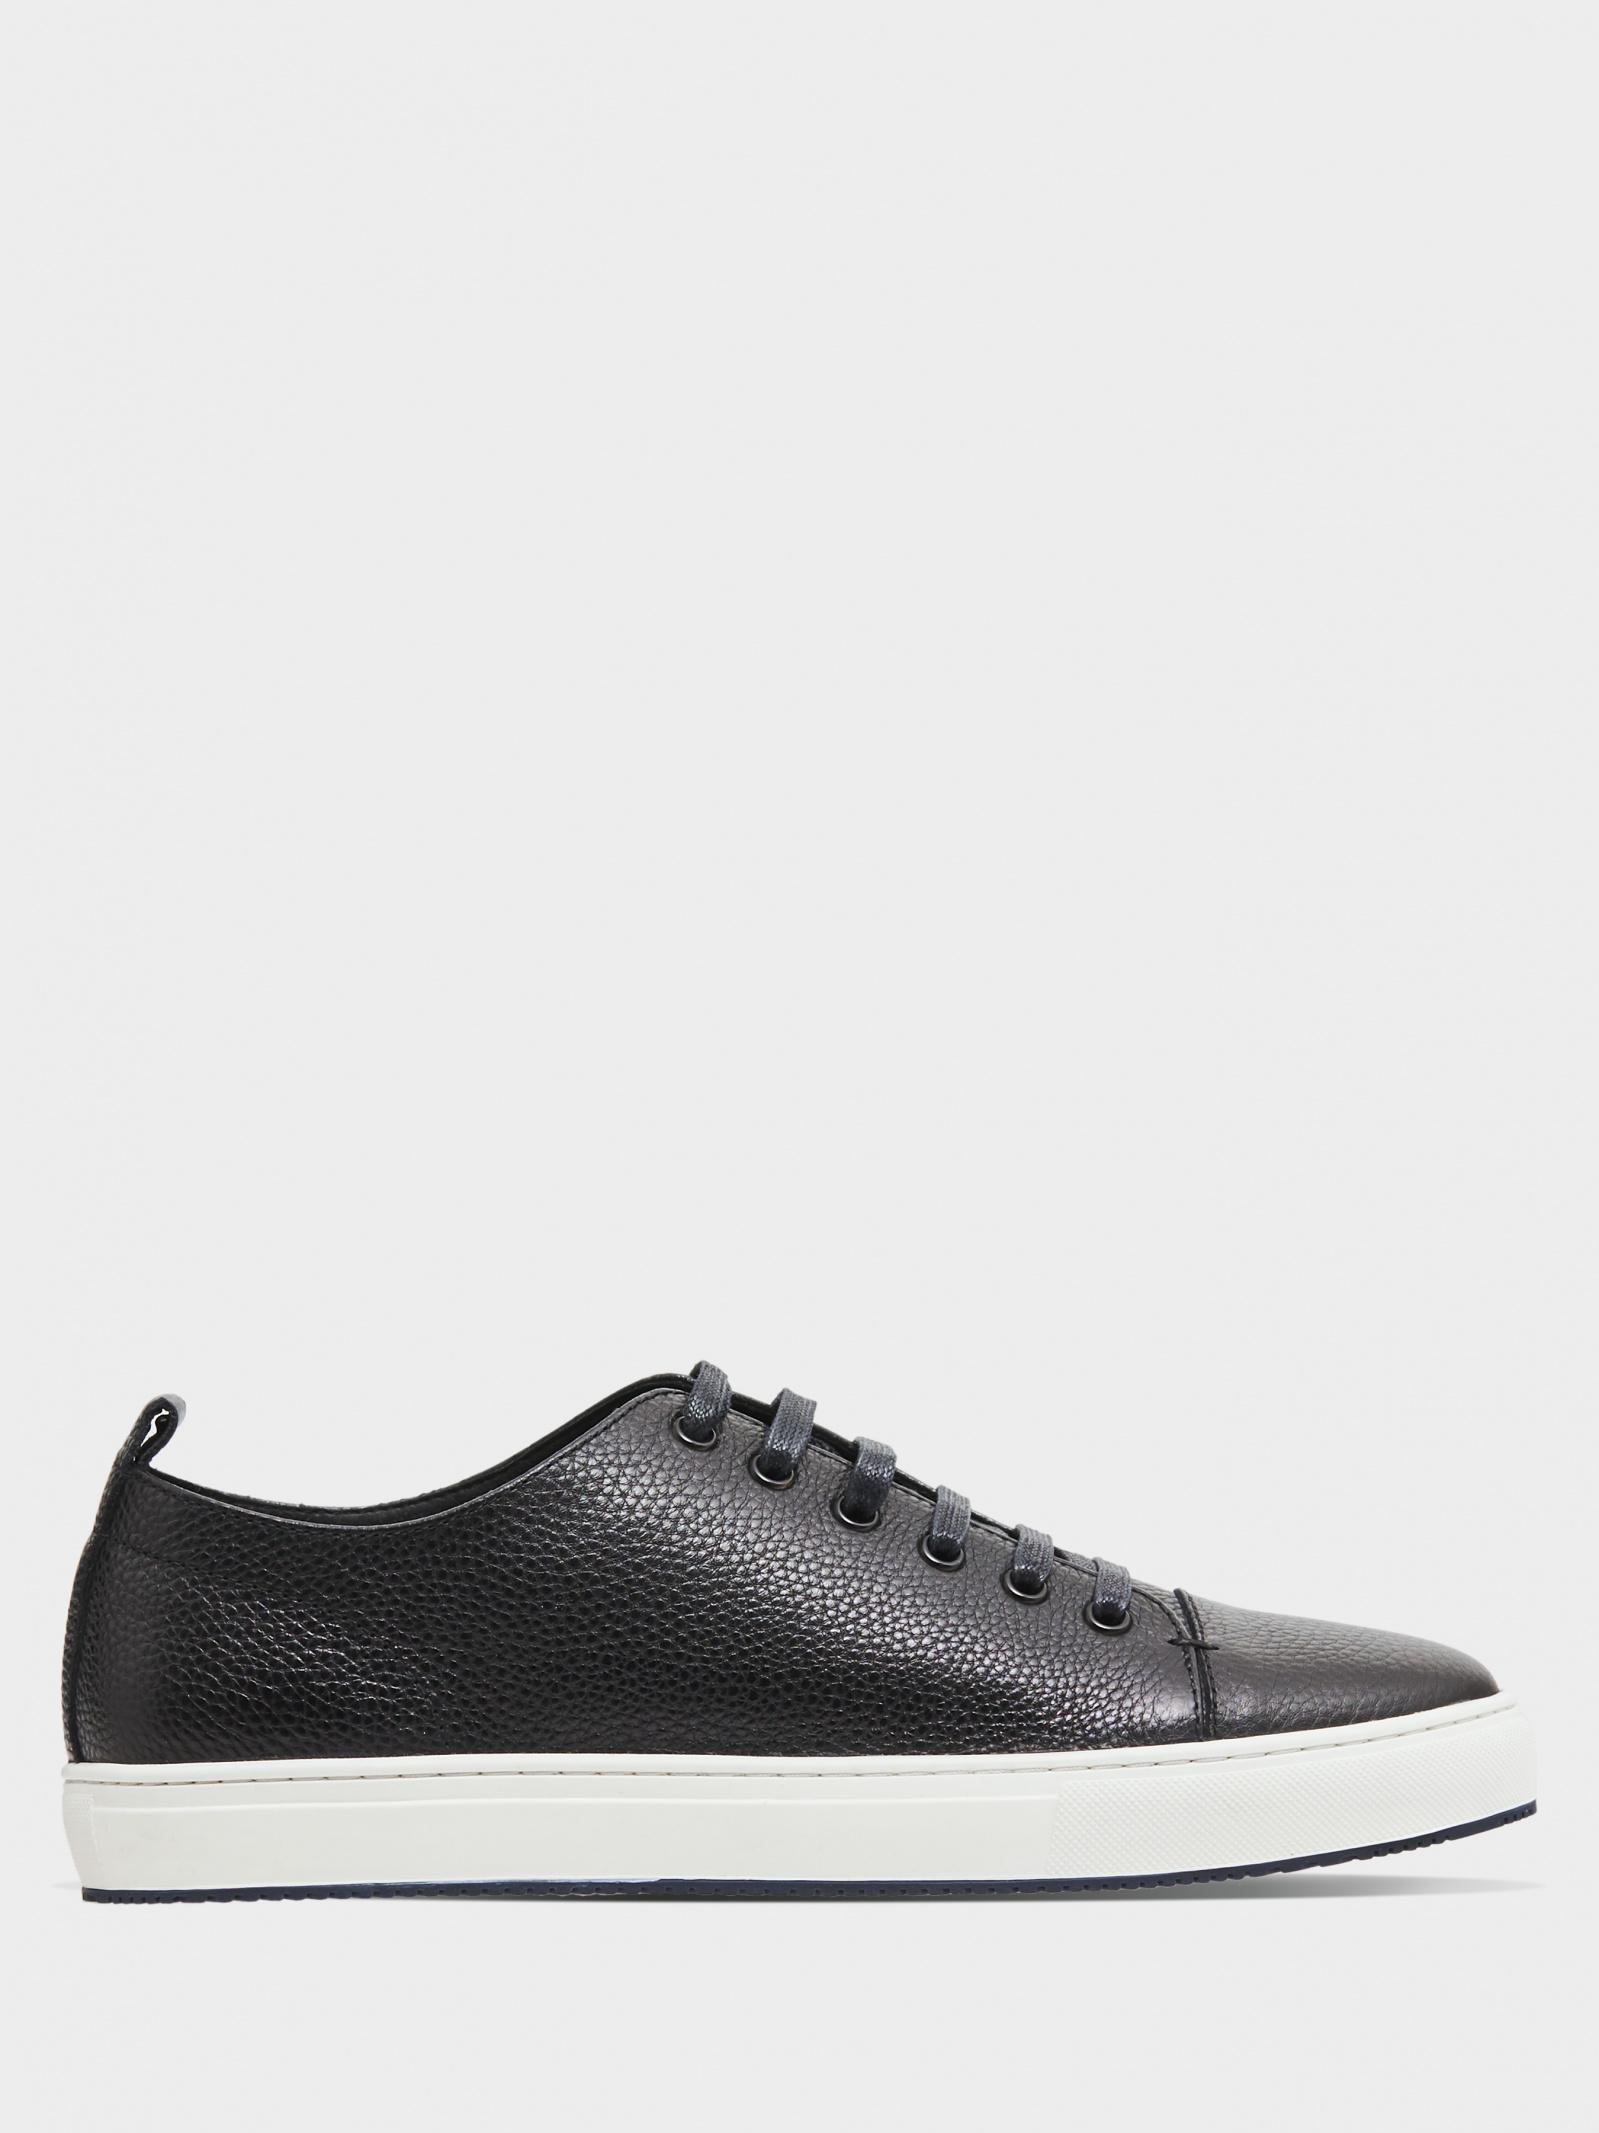 Кеды для мужчин Braska 224-1824/101 размеры обуви, 2017